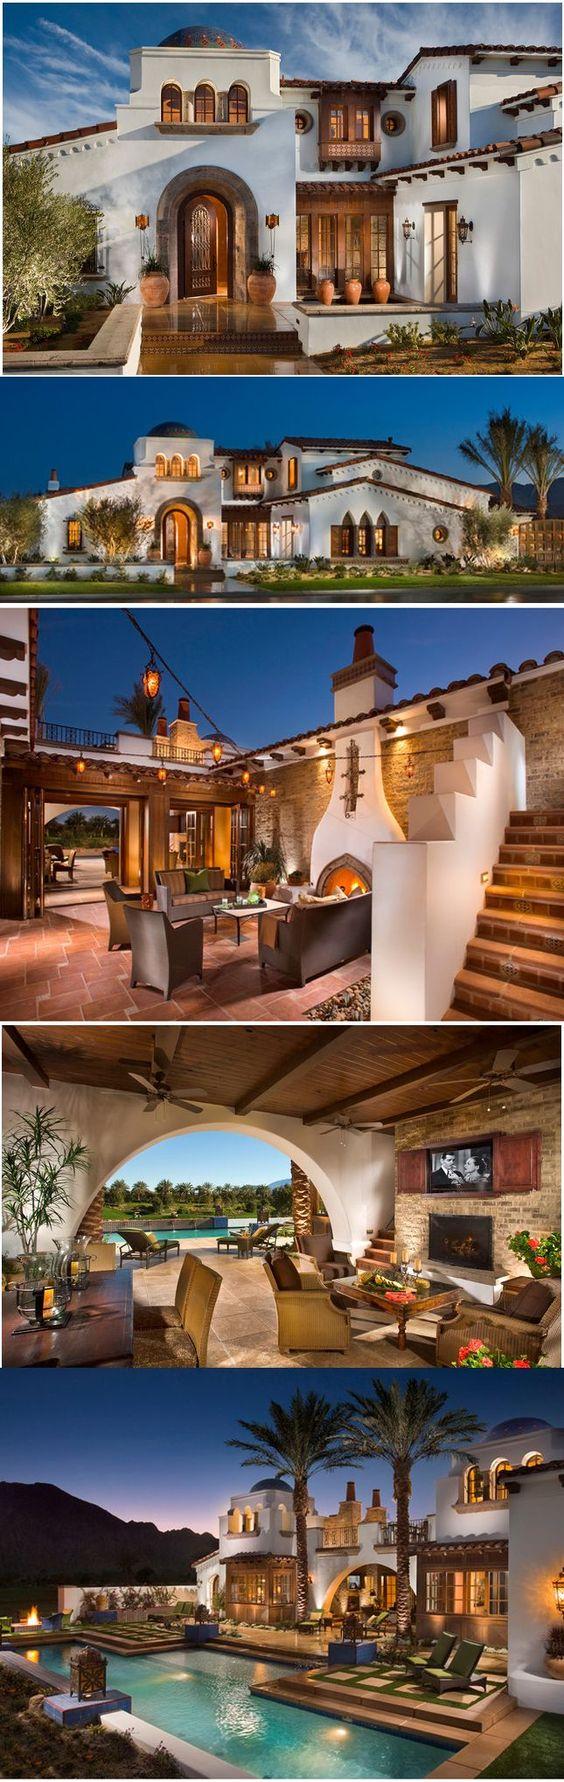 Spanish Santa Barbara home. Beautiful inside and out!!